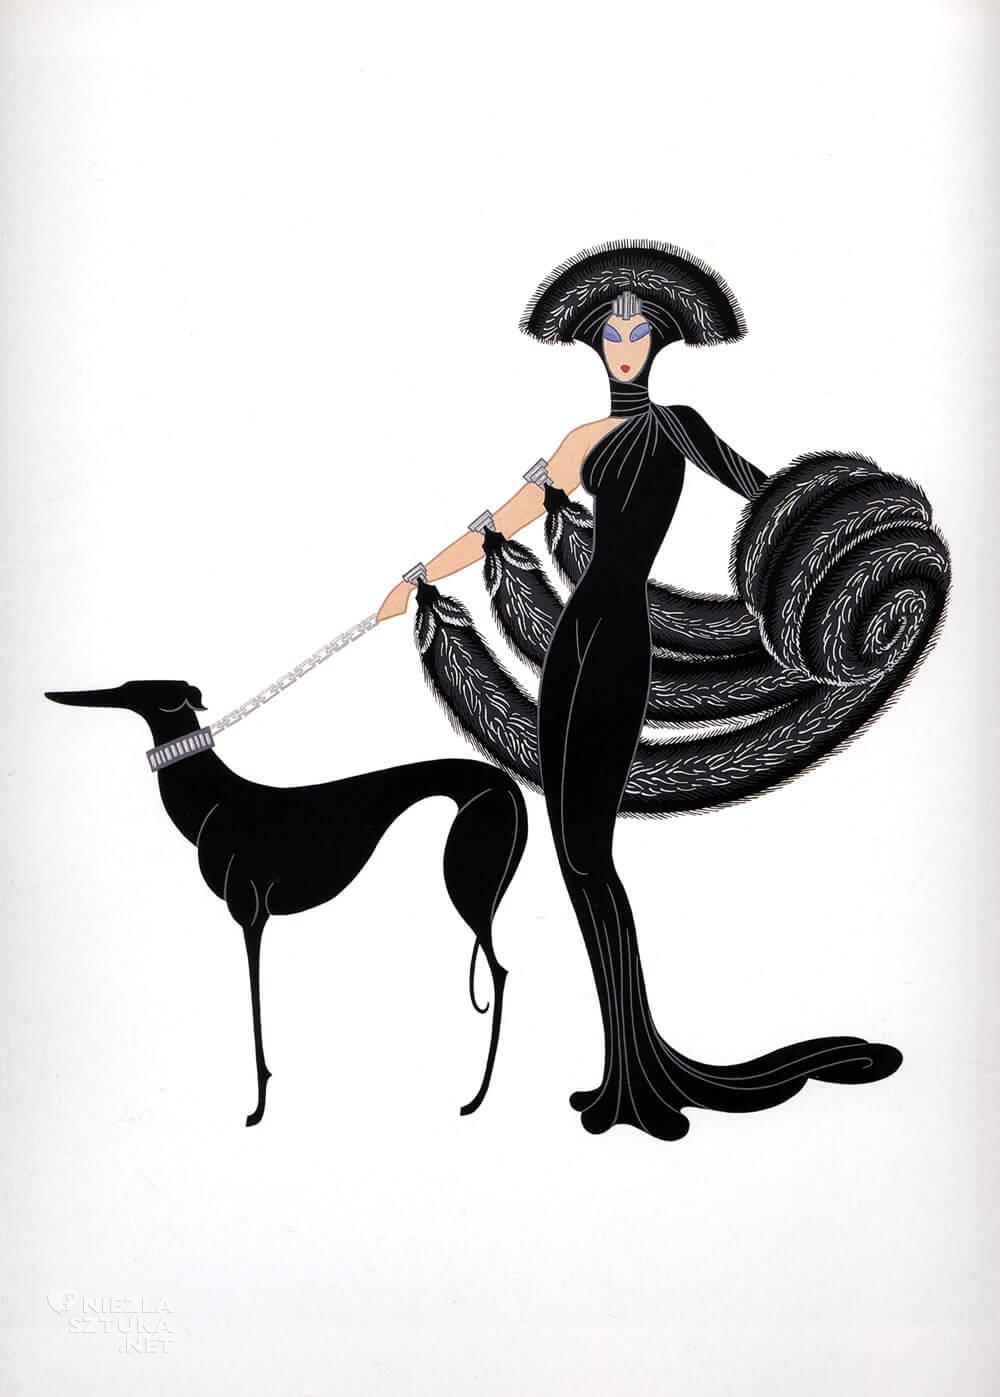 Erte, Symfonia w czerni, Romain de Tirtoff, moda, grafika, ilustracja, Art deco, Niezła Sztuka